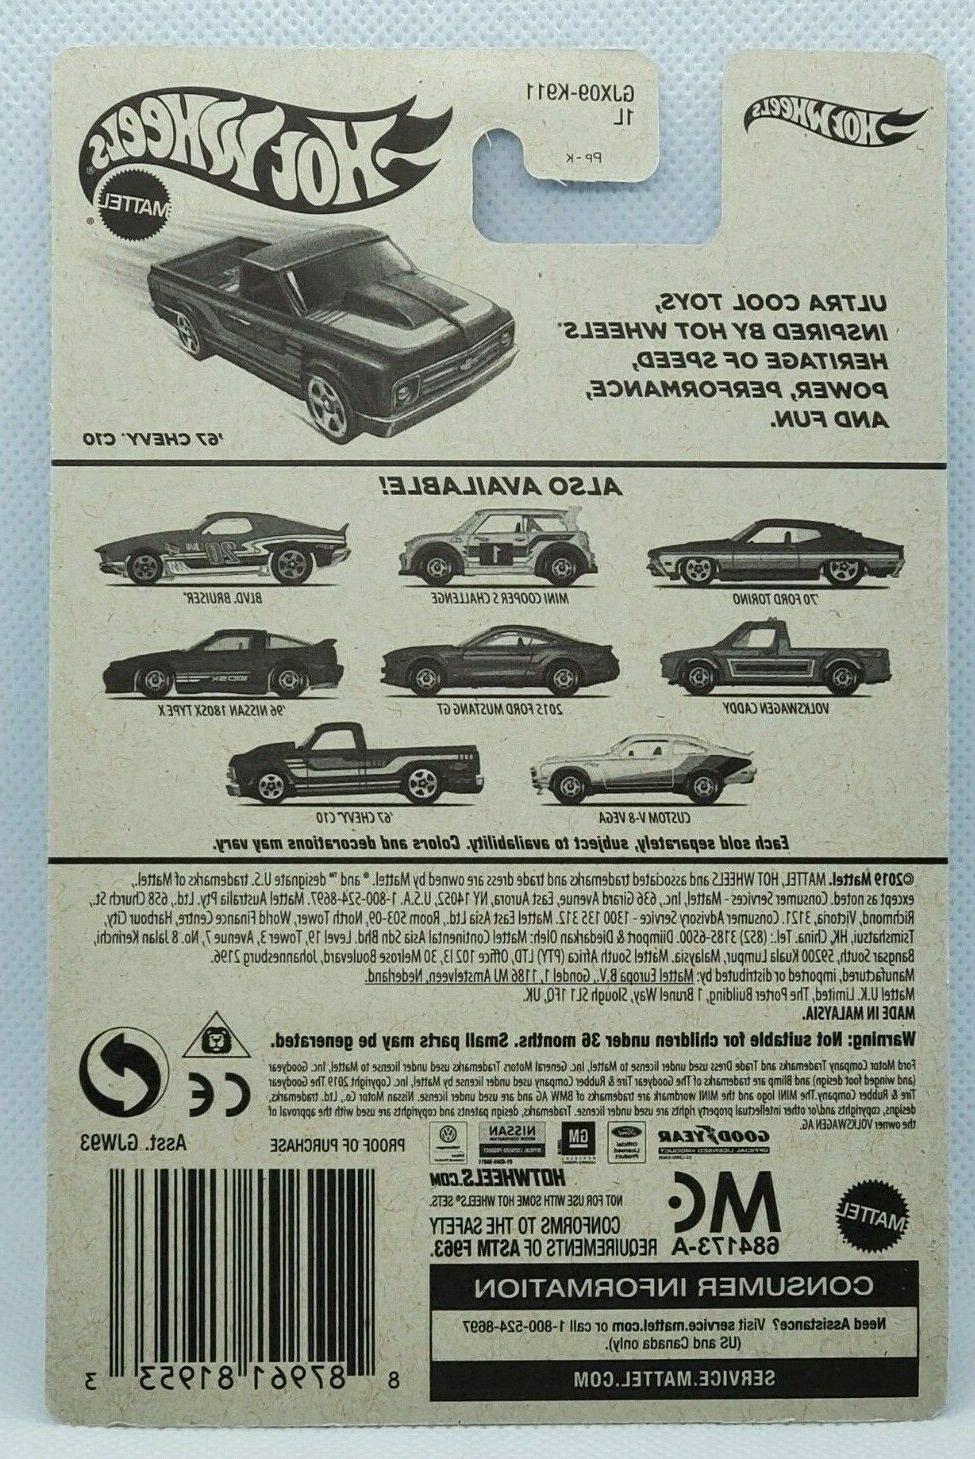 2020 Wheels Customs Brown 70 Ford Torino